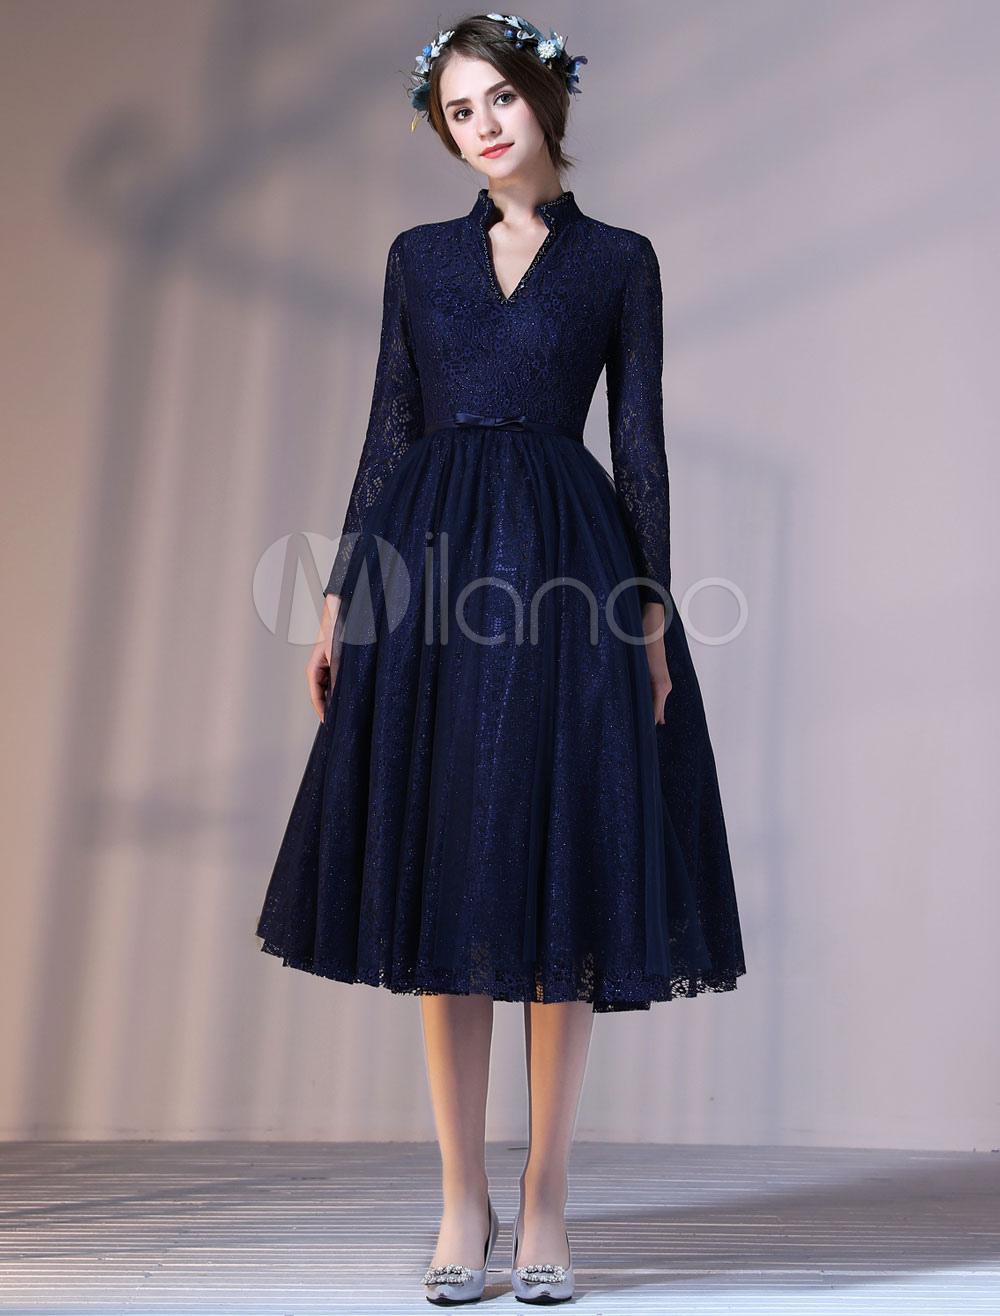 Dark Navy Cocktail Dresses V Neck Long Sleeve Illusion Keyhole Beading Knee Length Homecoming Dresses (Wedding) photo